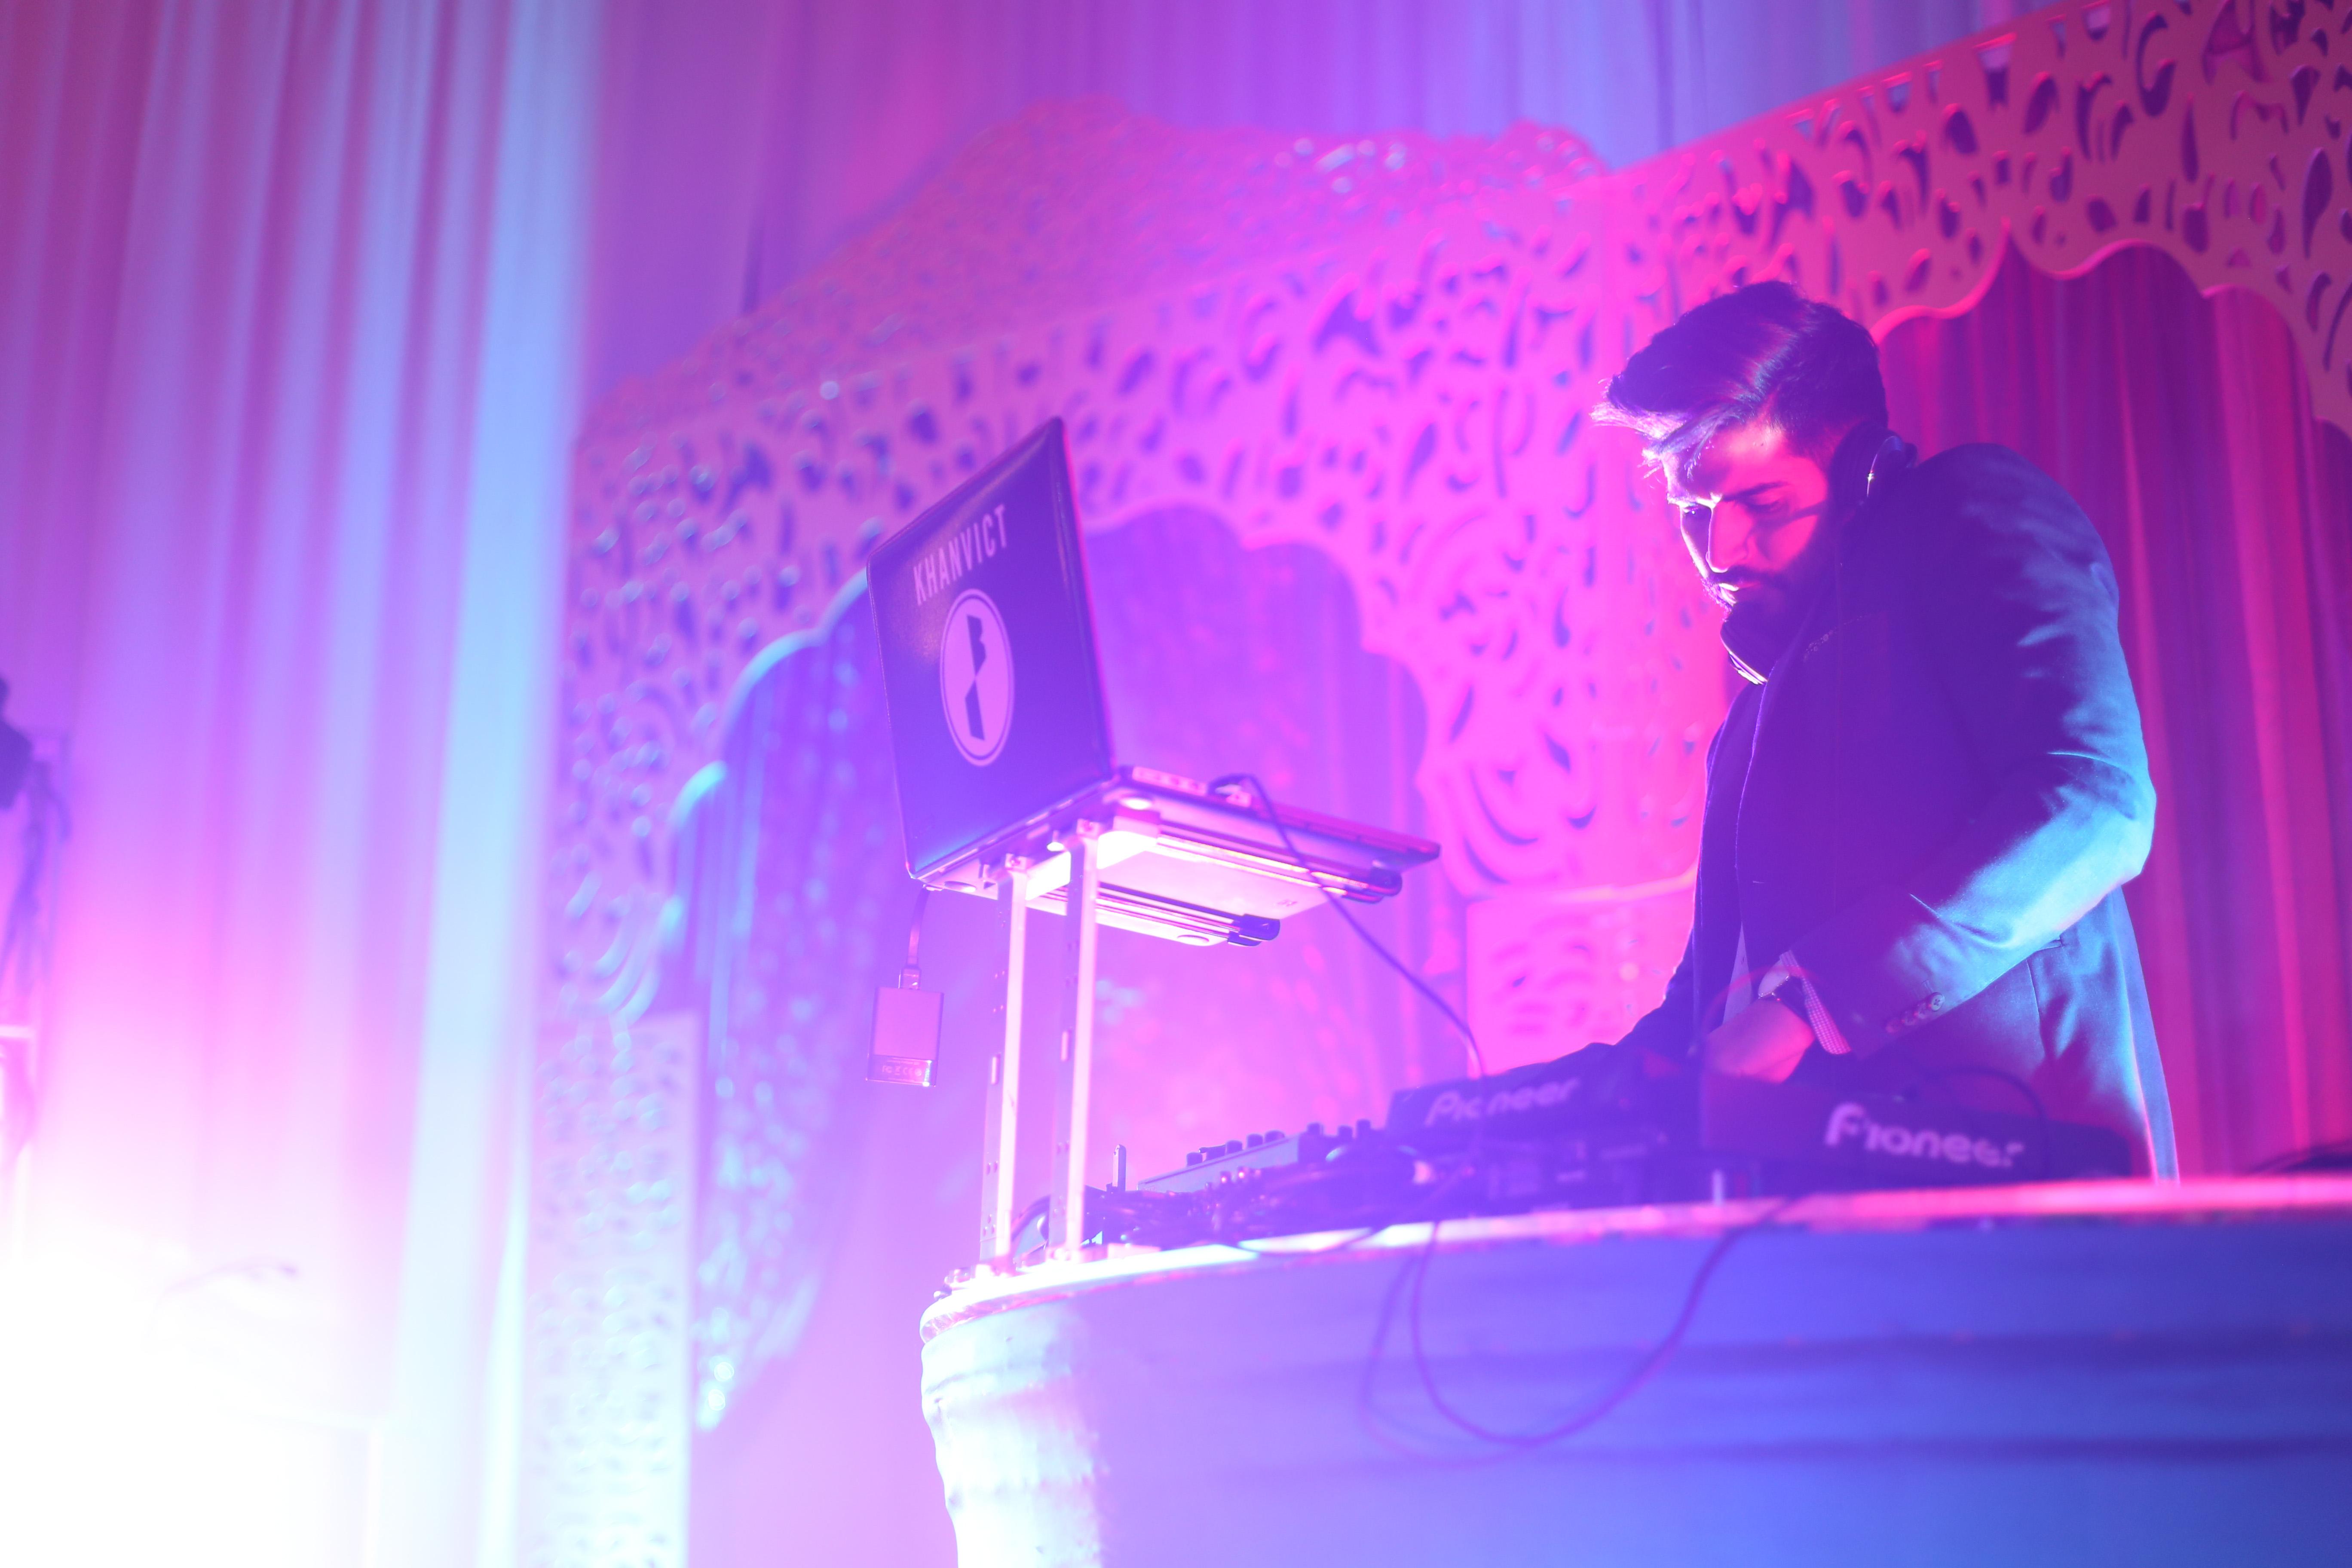 DJ_Khanvict_(2).jpg